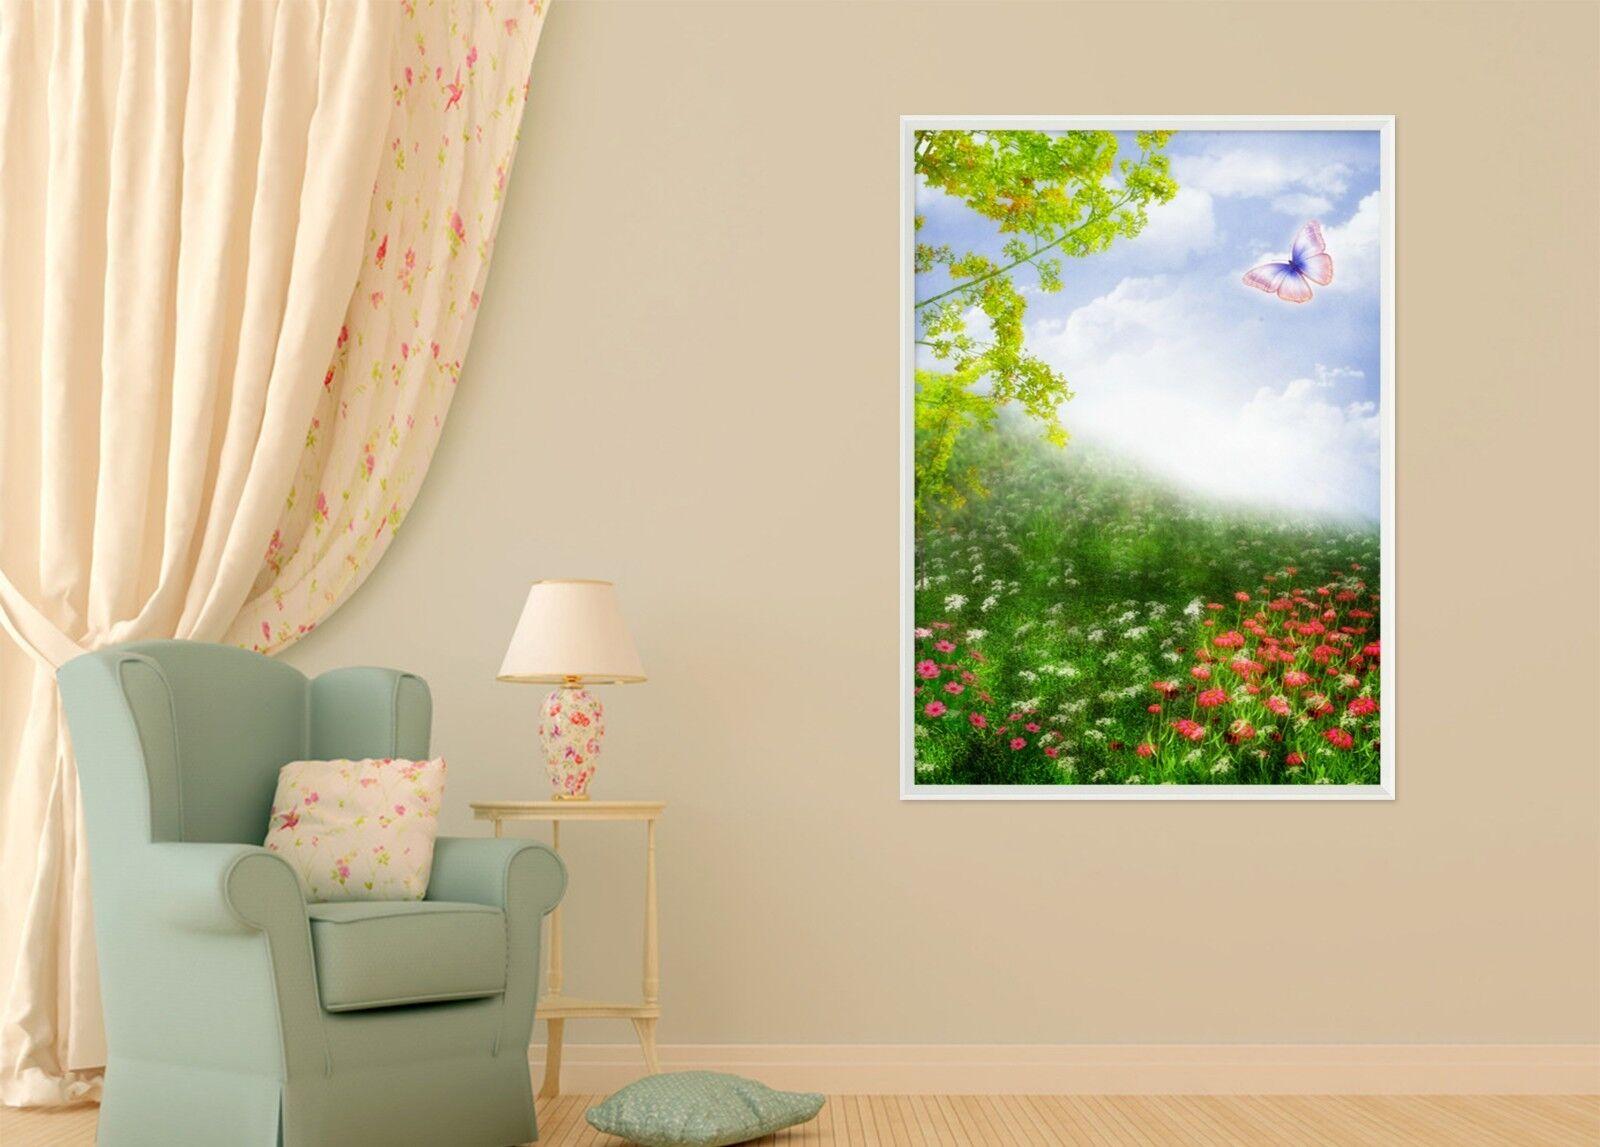 3D Flower Butterfly 6 Framed Poster Home Decor Print Painting Art AJ AU